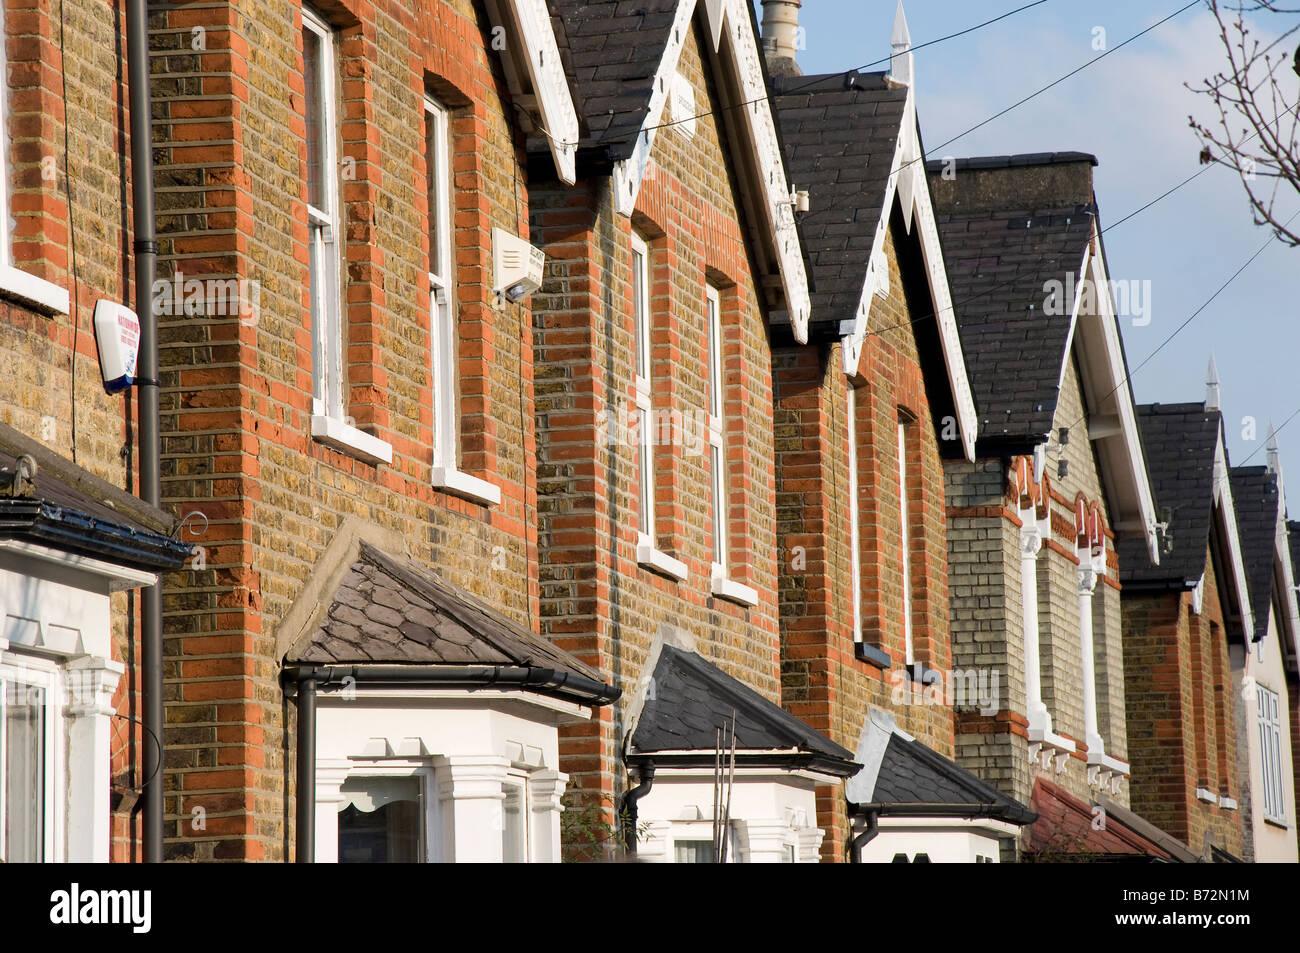 Kingston Upon Thames Houses Stock Photos & Kingston Upon Thames ...